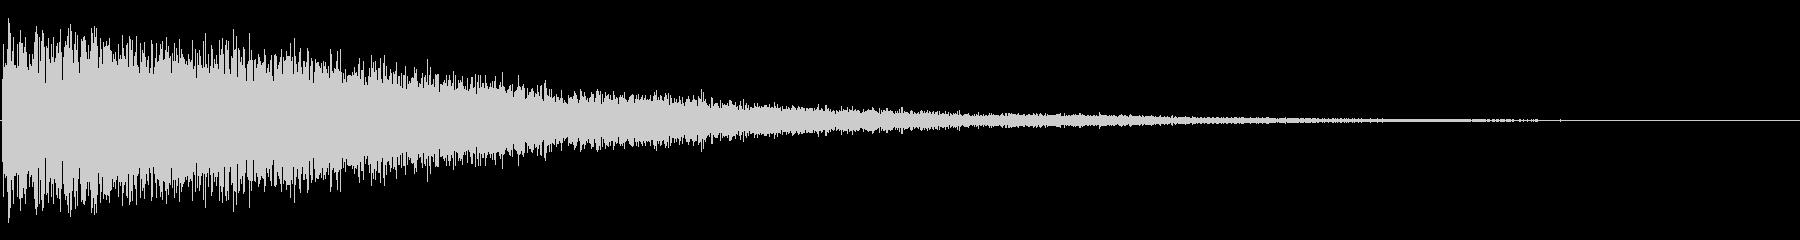 BIG ECHOEY GONG H...の未再生の波形